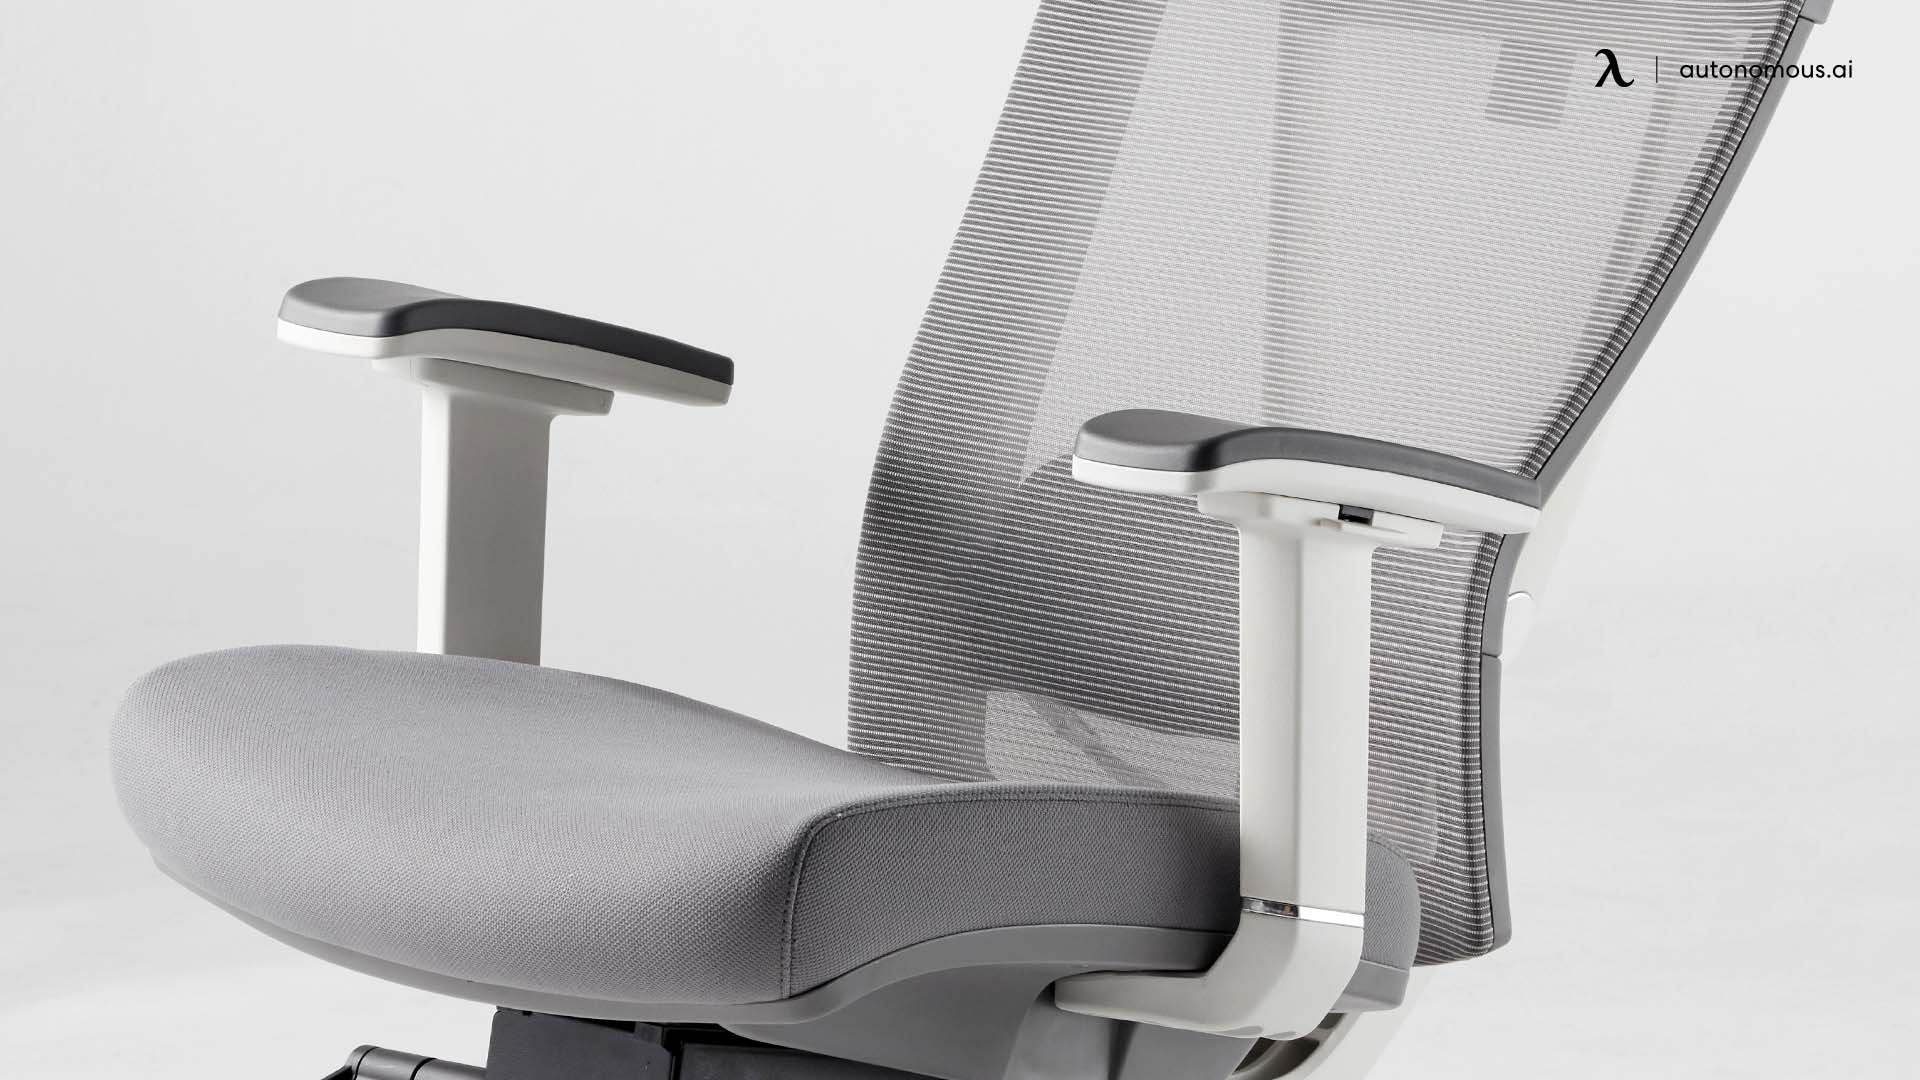 The design of the backrest